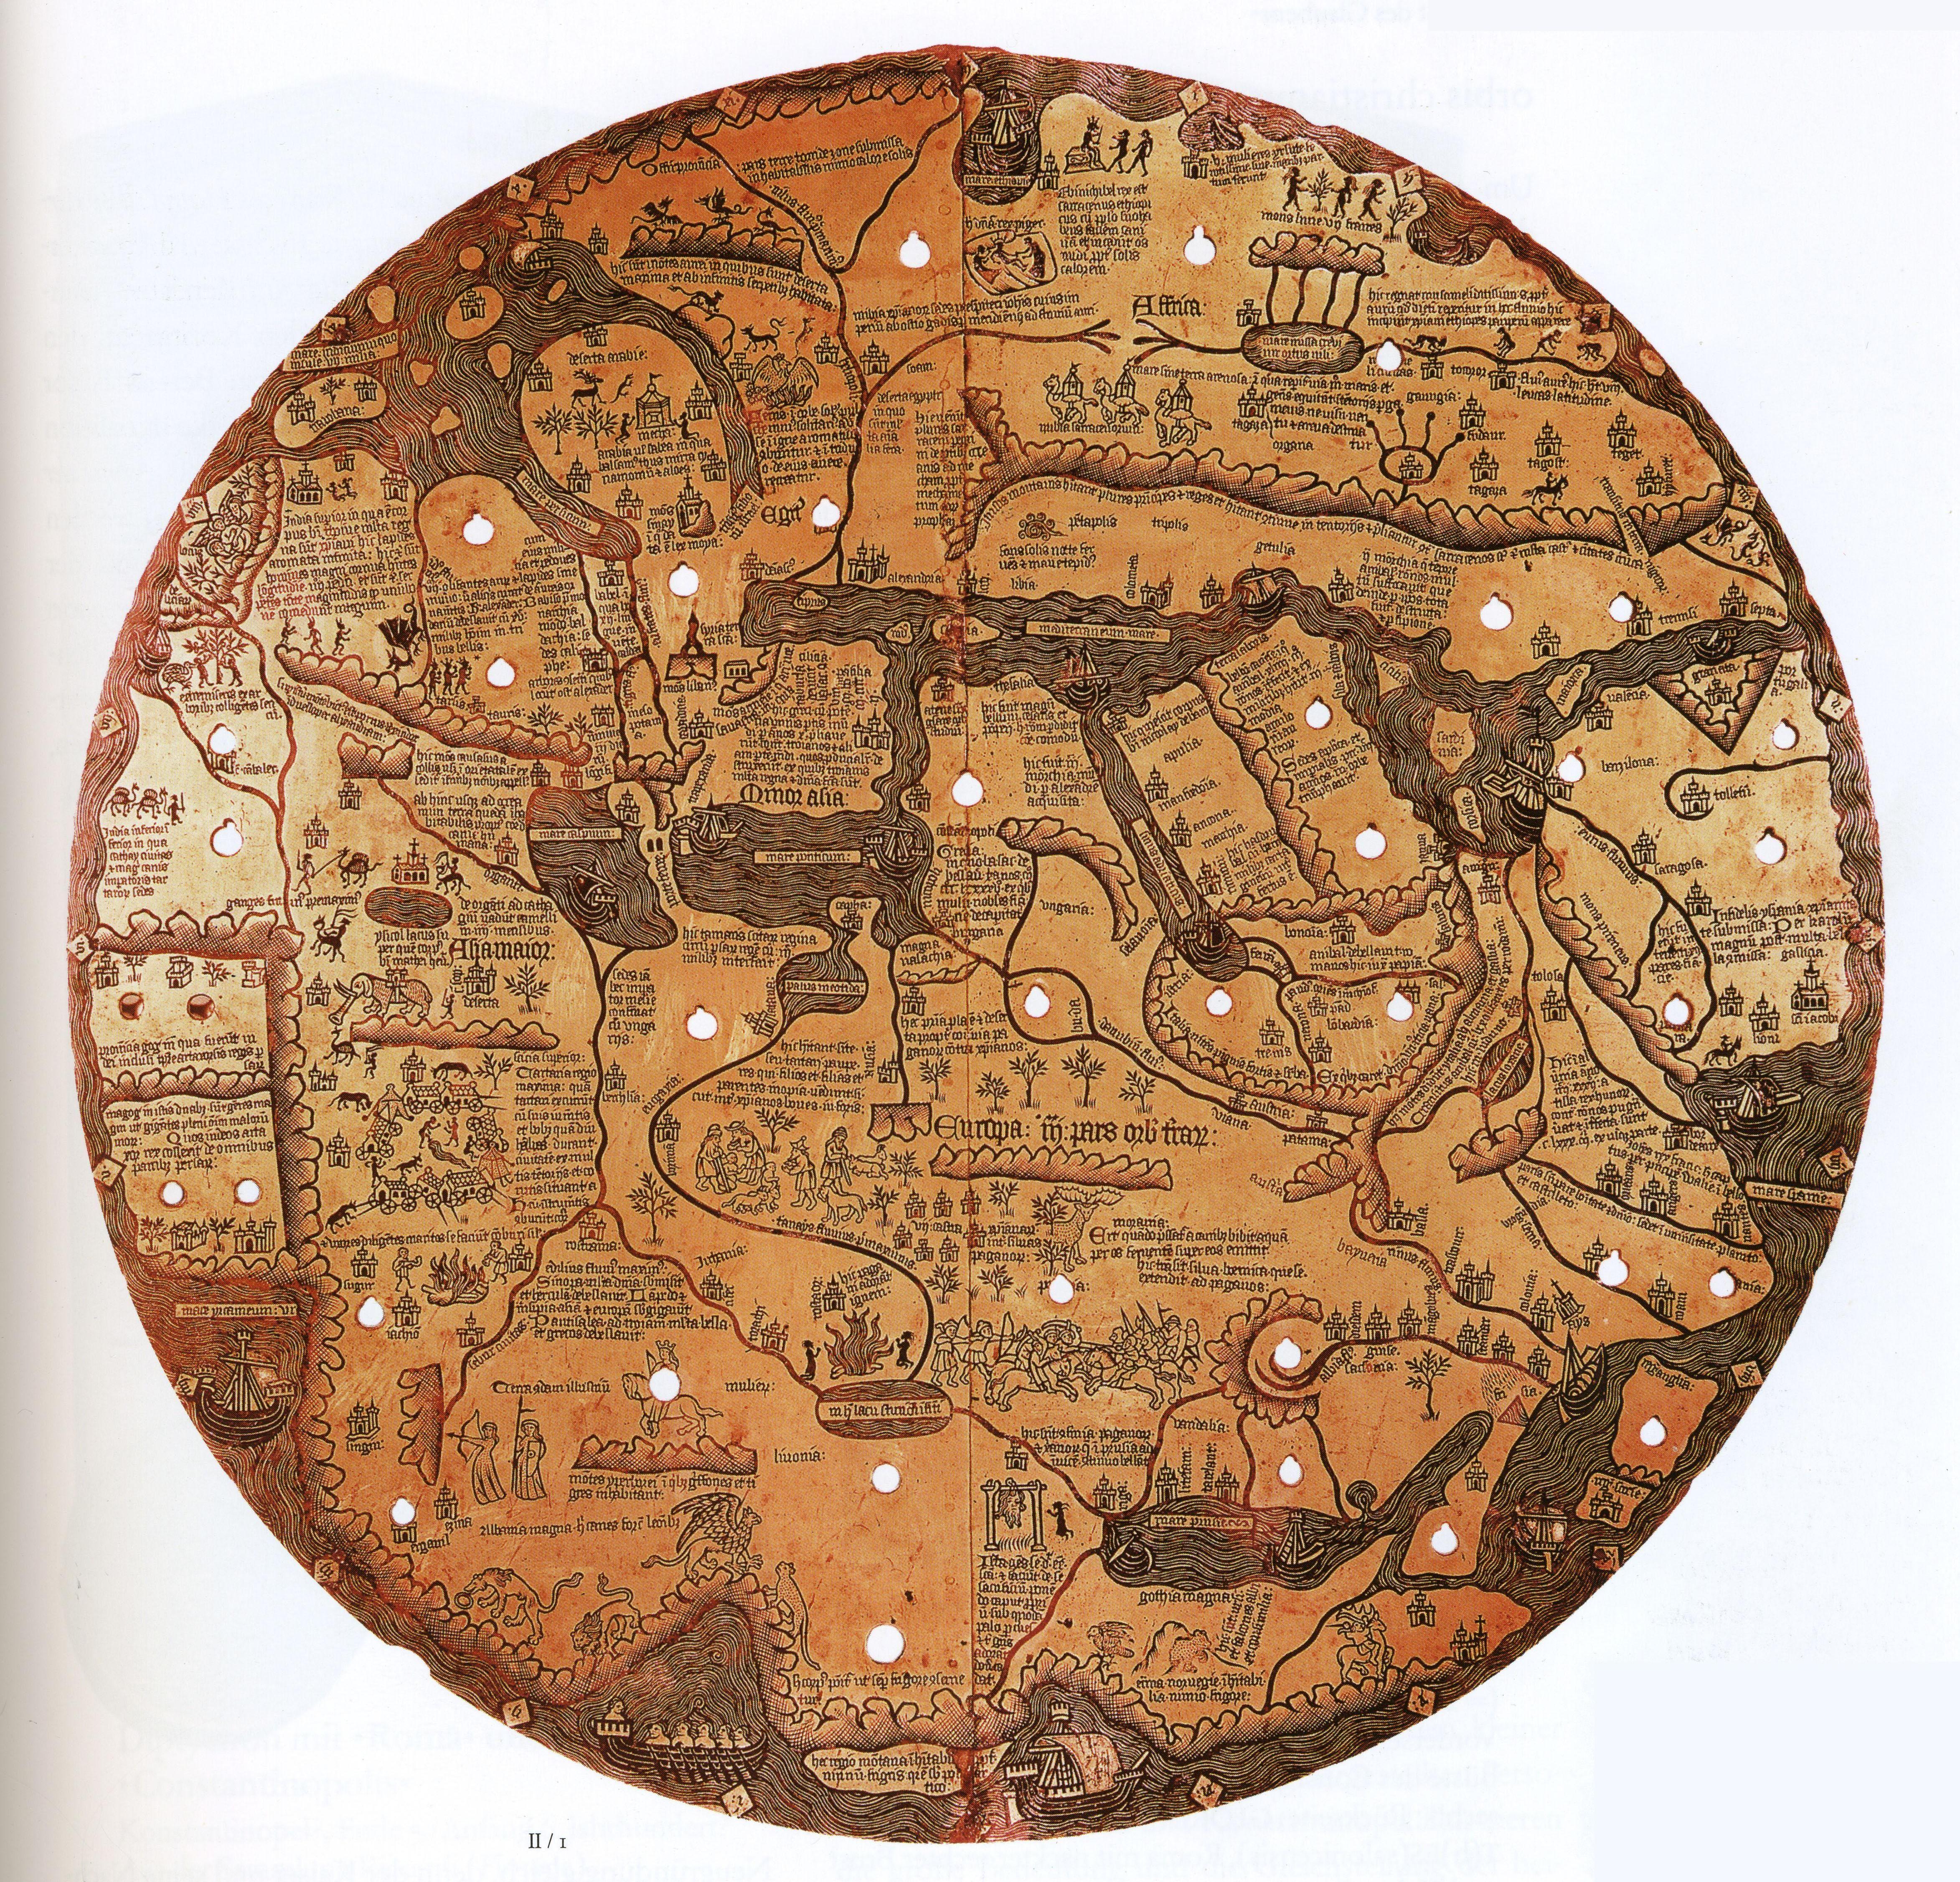 The Mappamondo Borgiano anonymous 15th century map